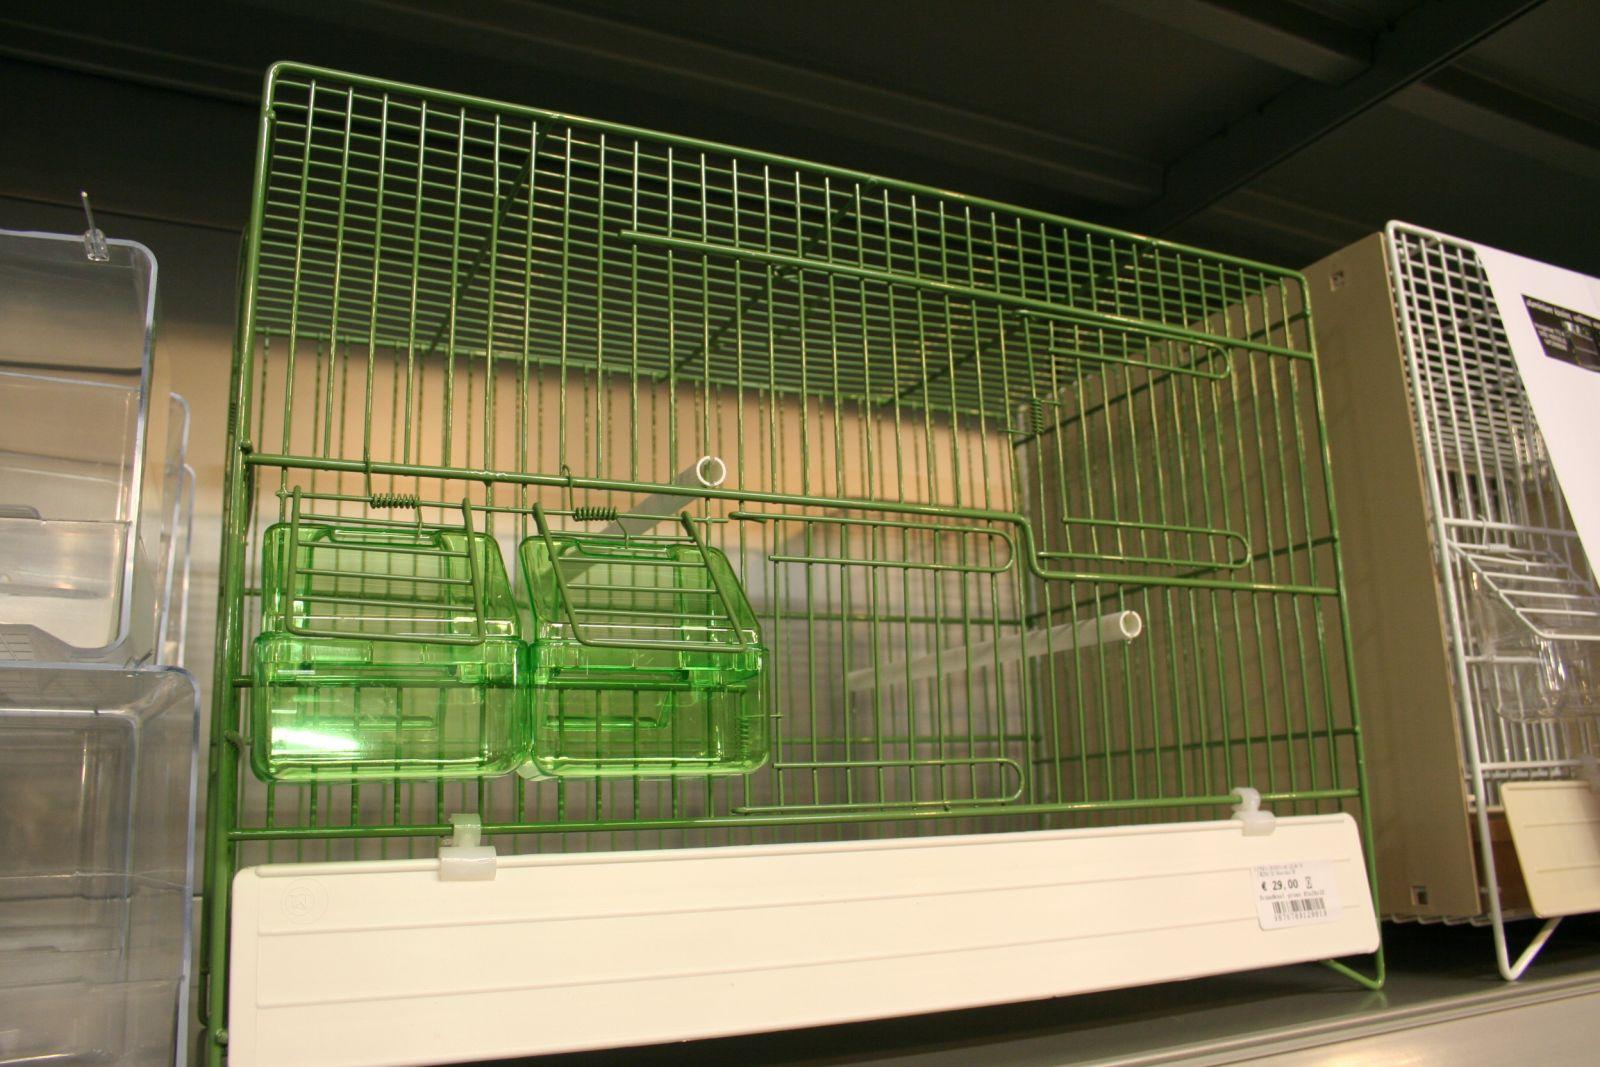 draadkooi groen b45 x d25 x h32cm